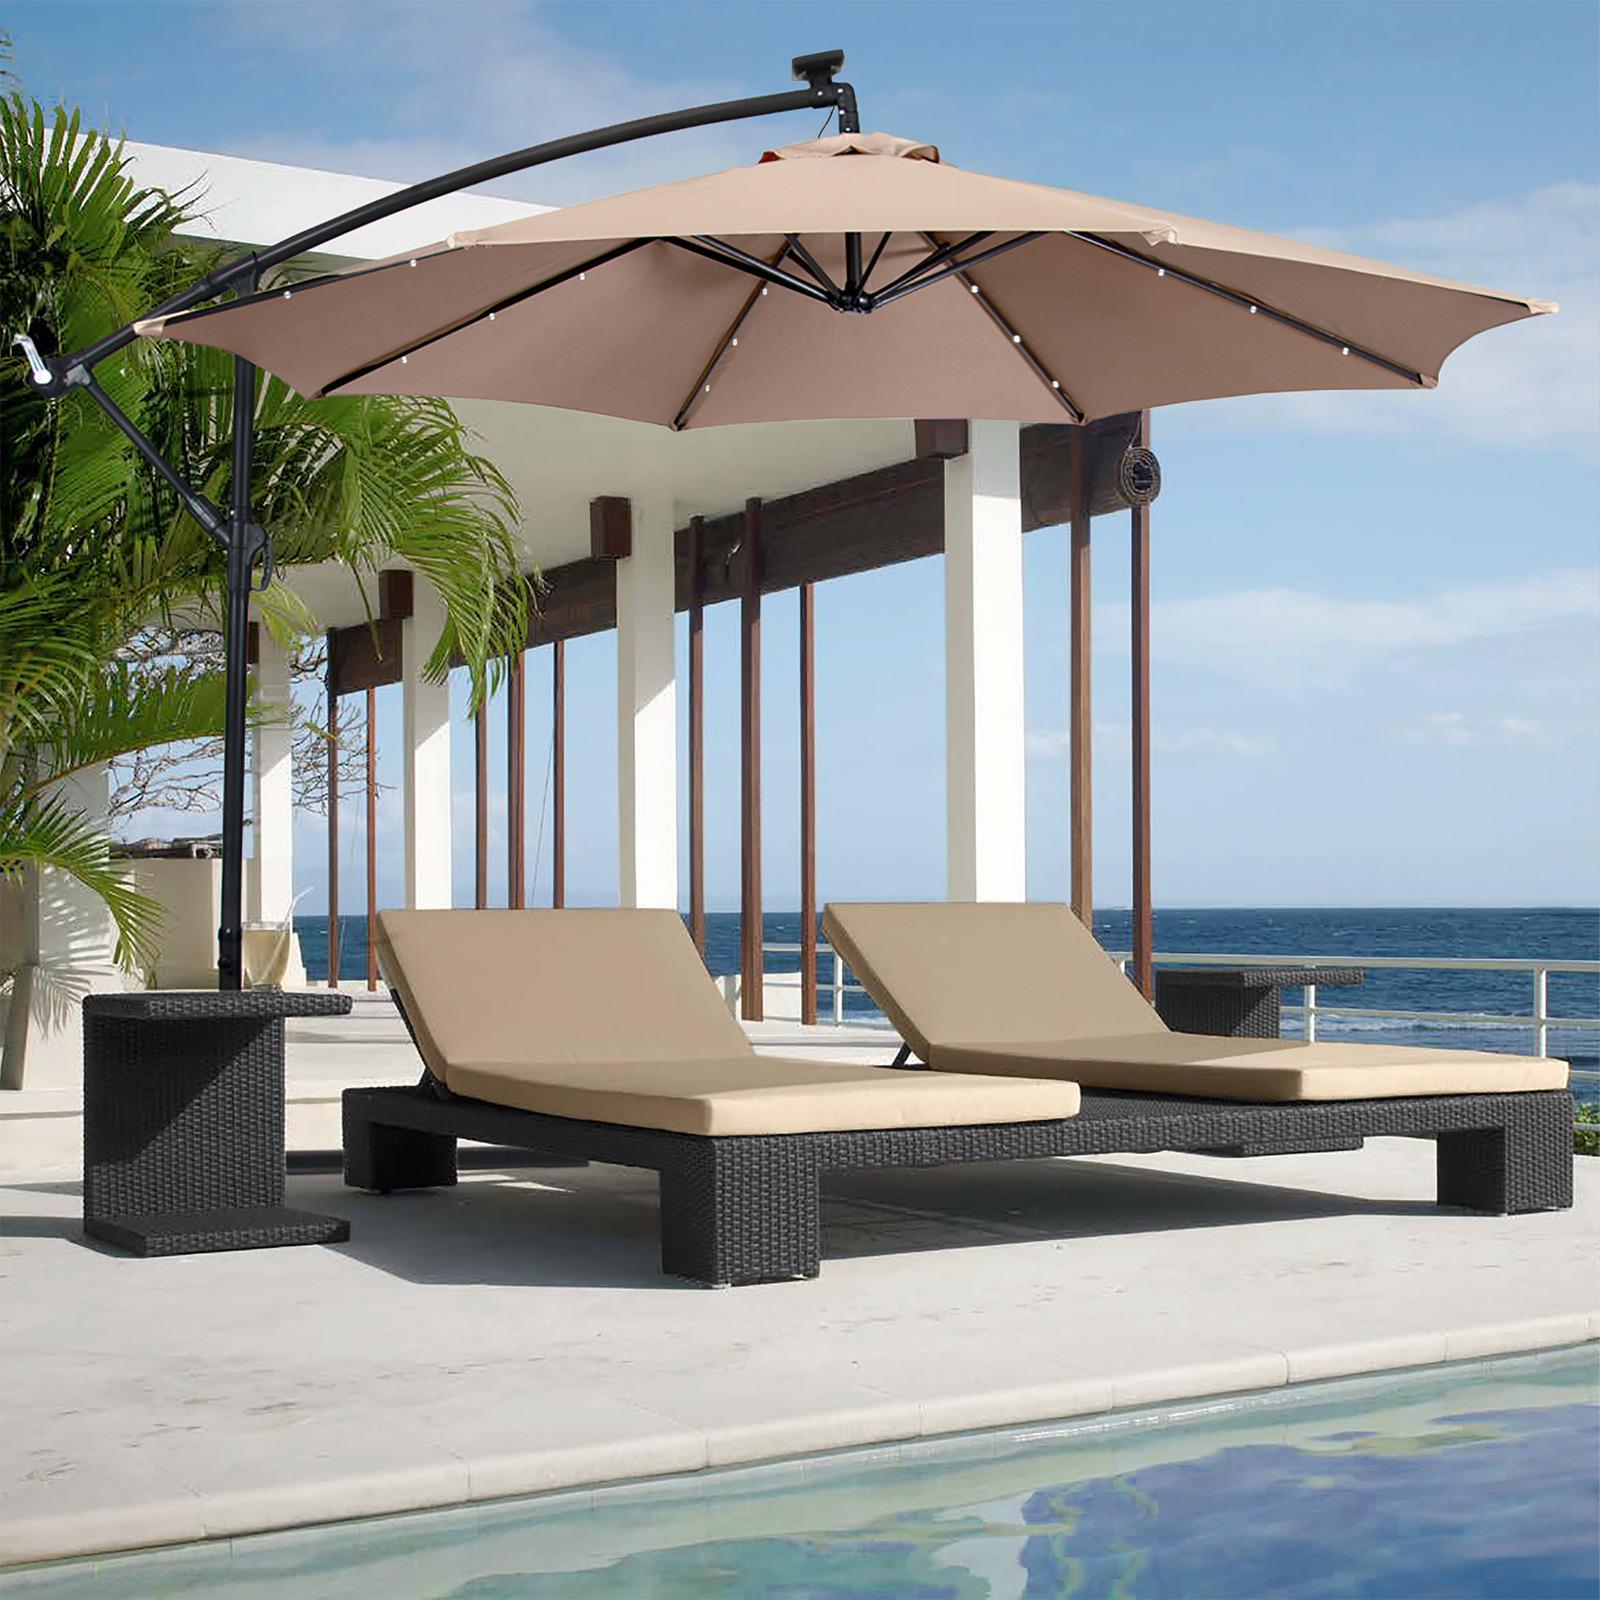 10ft Solar LED Hanging Patio/Deck Umbrella w/ Easy Tilt Adjustment